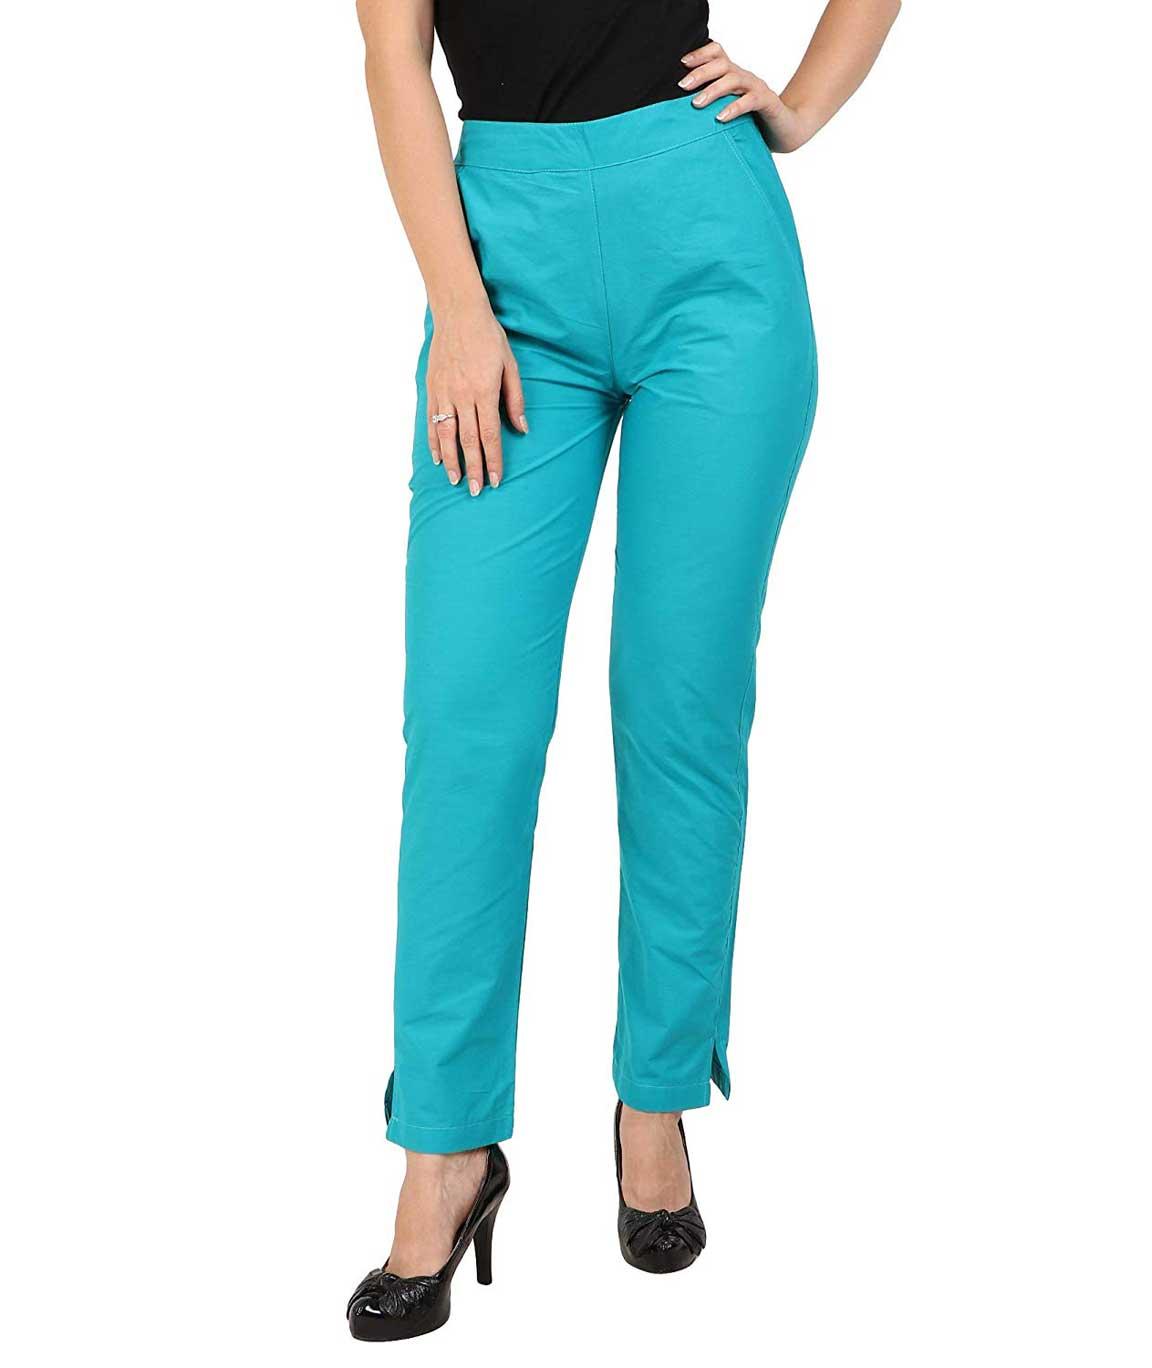 Makxziya Women`s Turquoise Regular Fit Cotton Trouser(Turquoise)